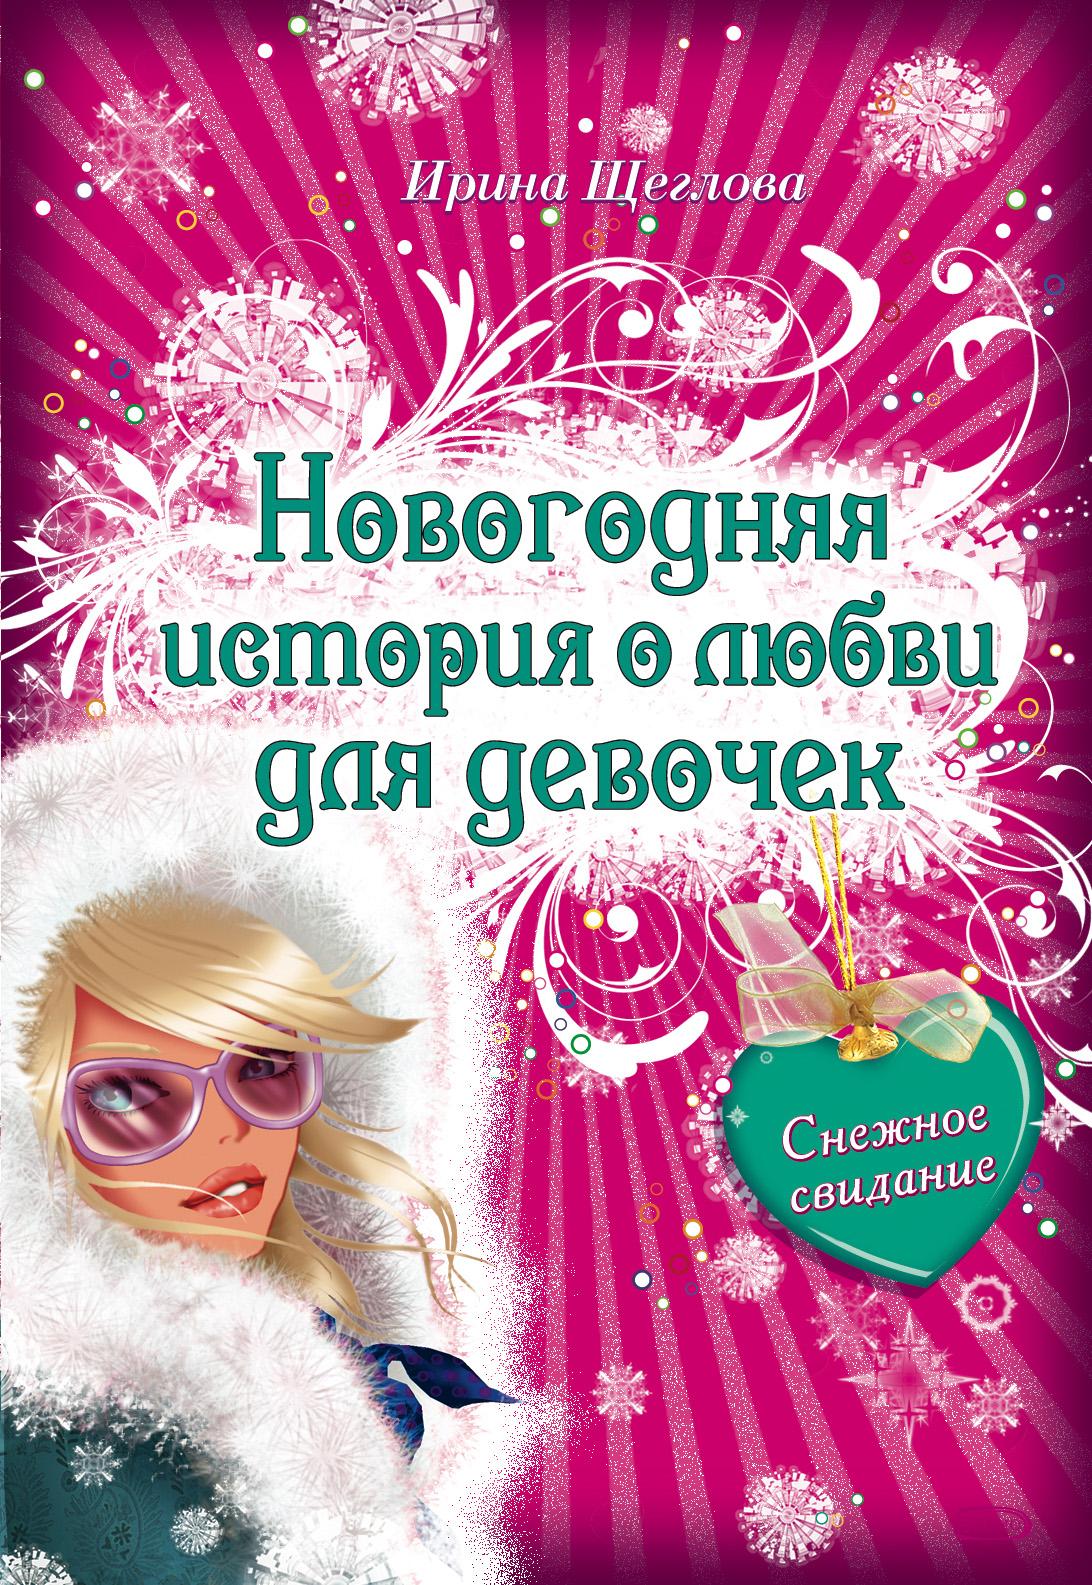 Снежное свидание ( Ирина Щеглова  )